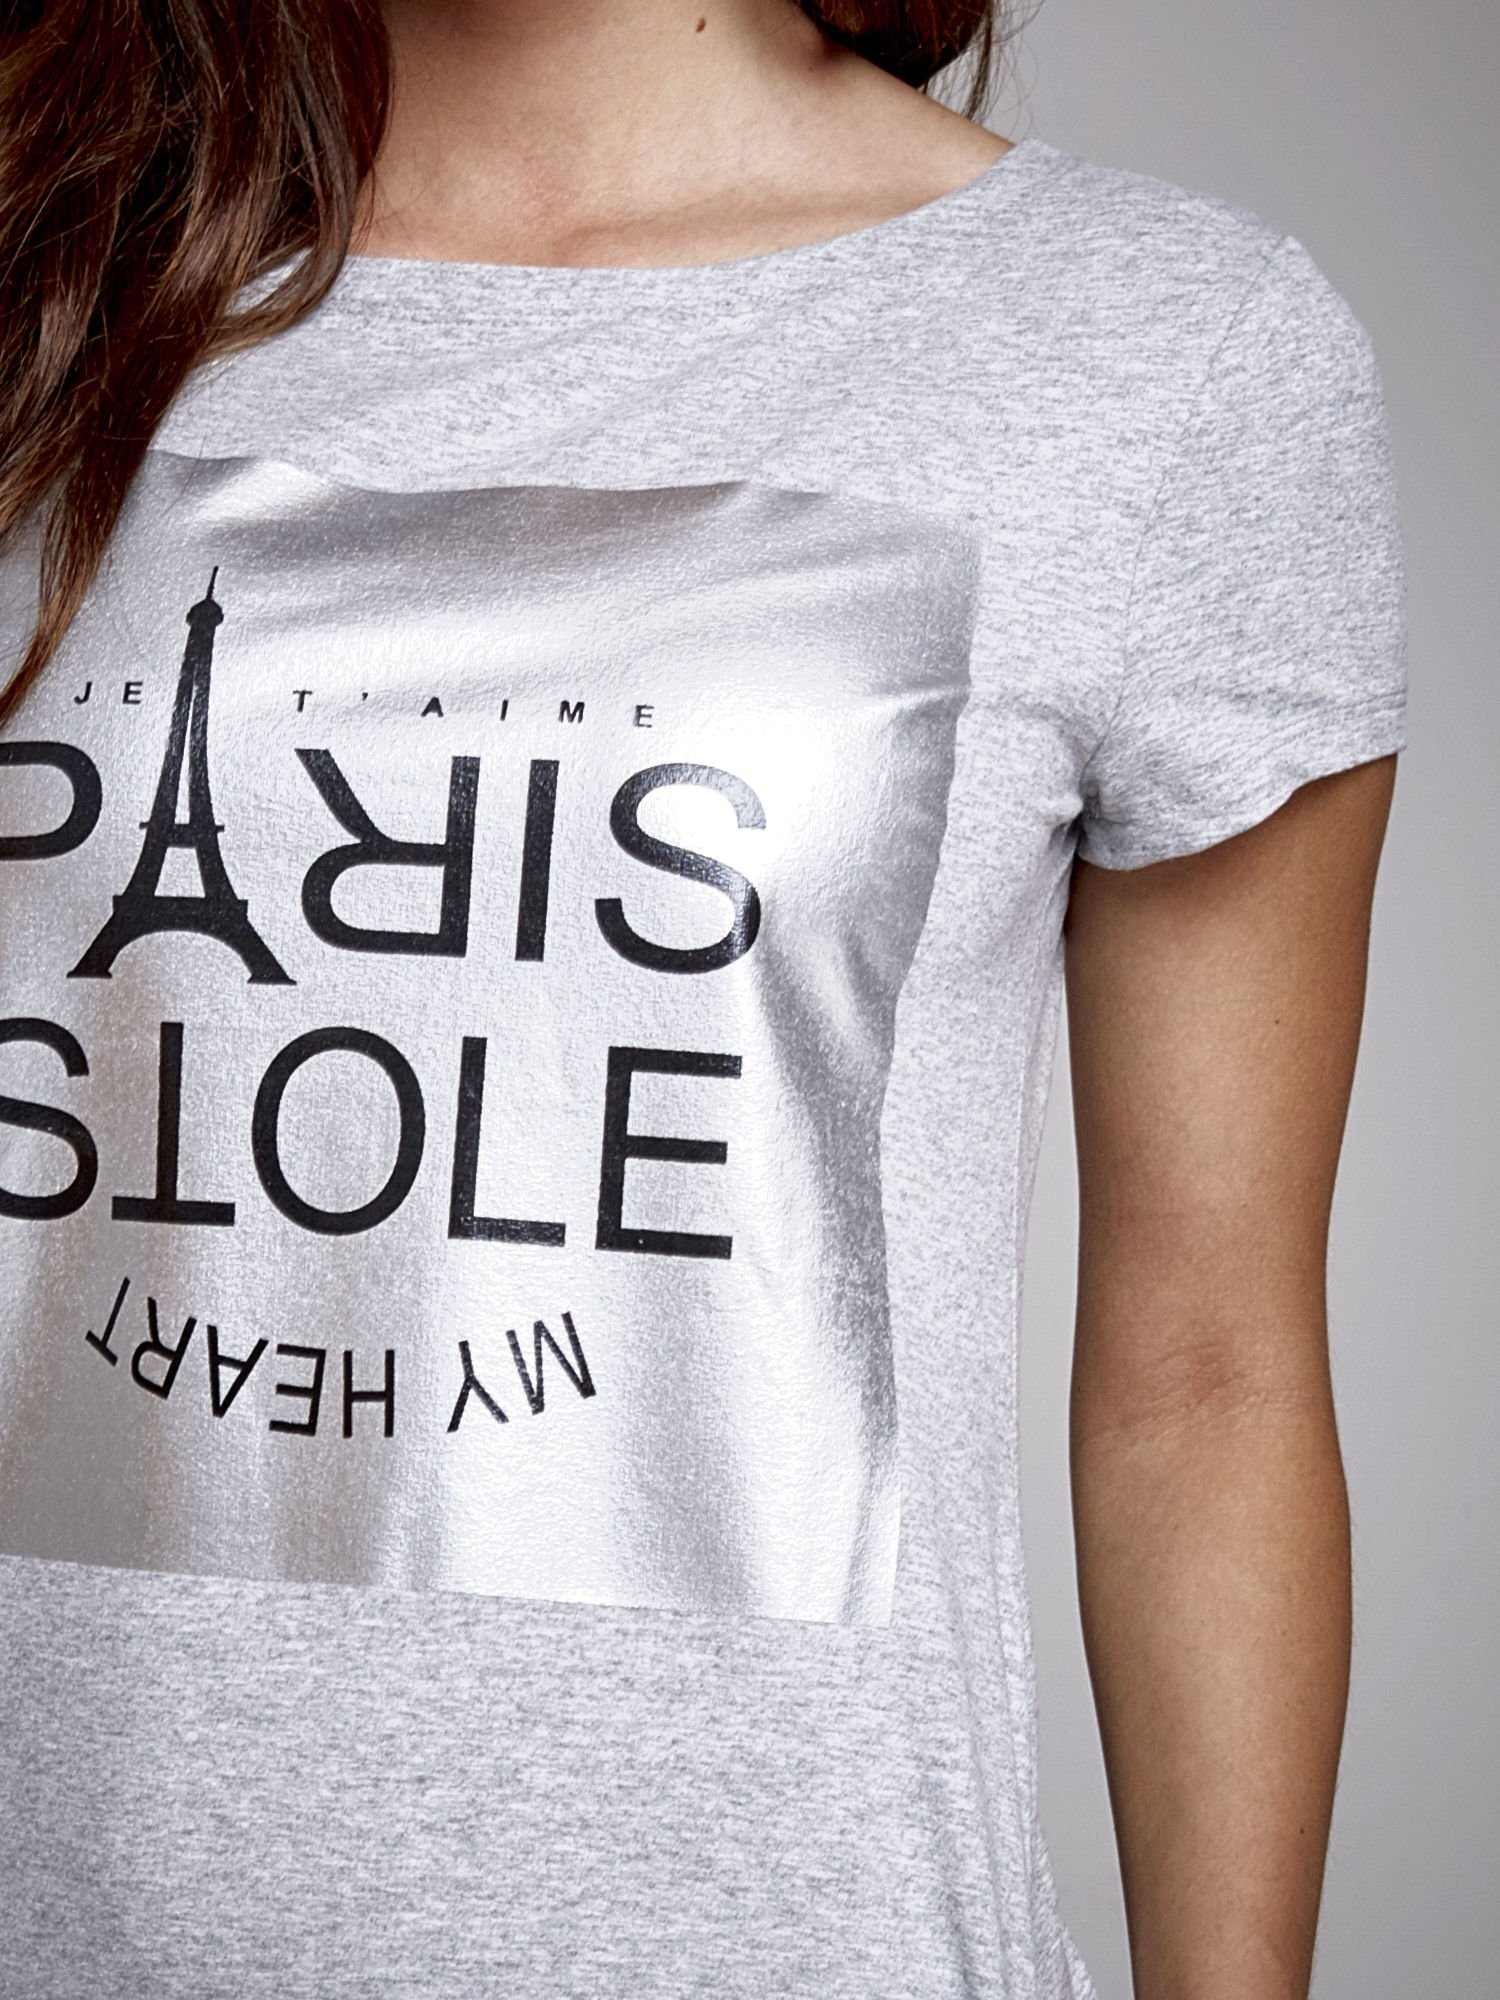 Szara sukienka dresowa ze srebrnym printem PARIS                                  zdj.                                  5